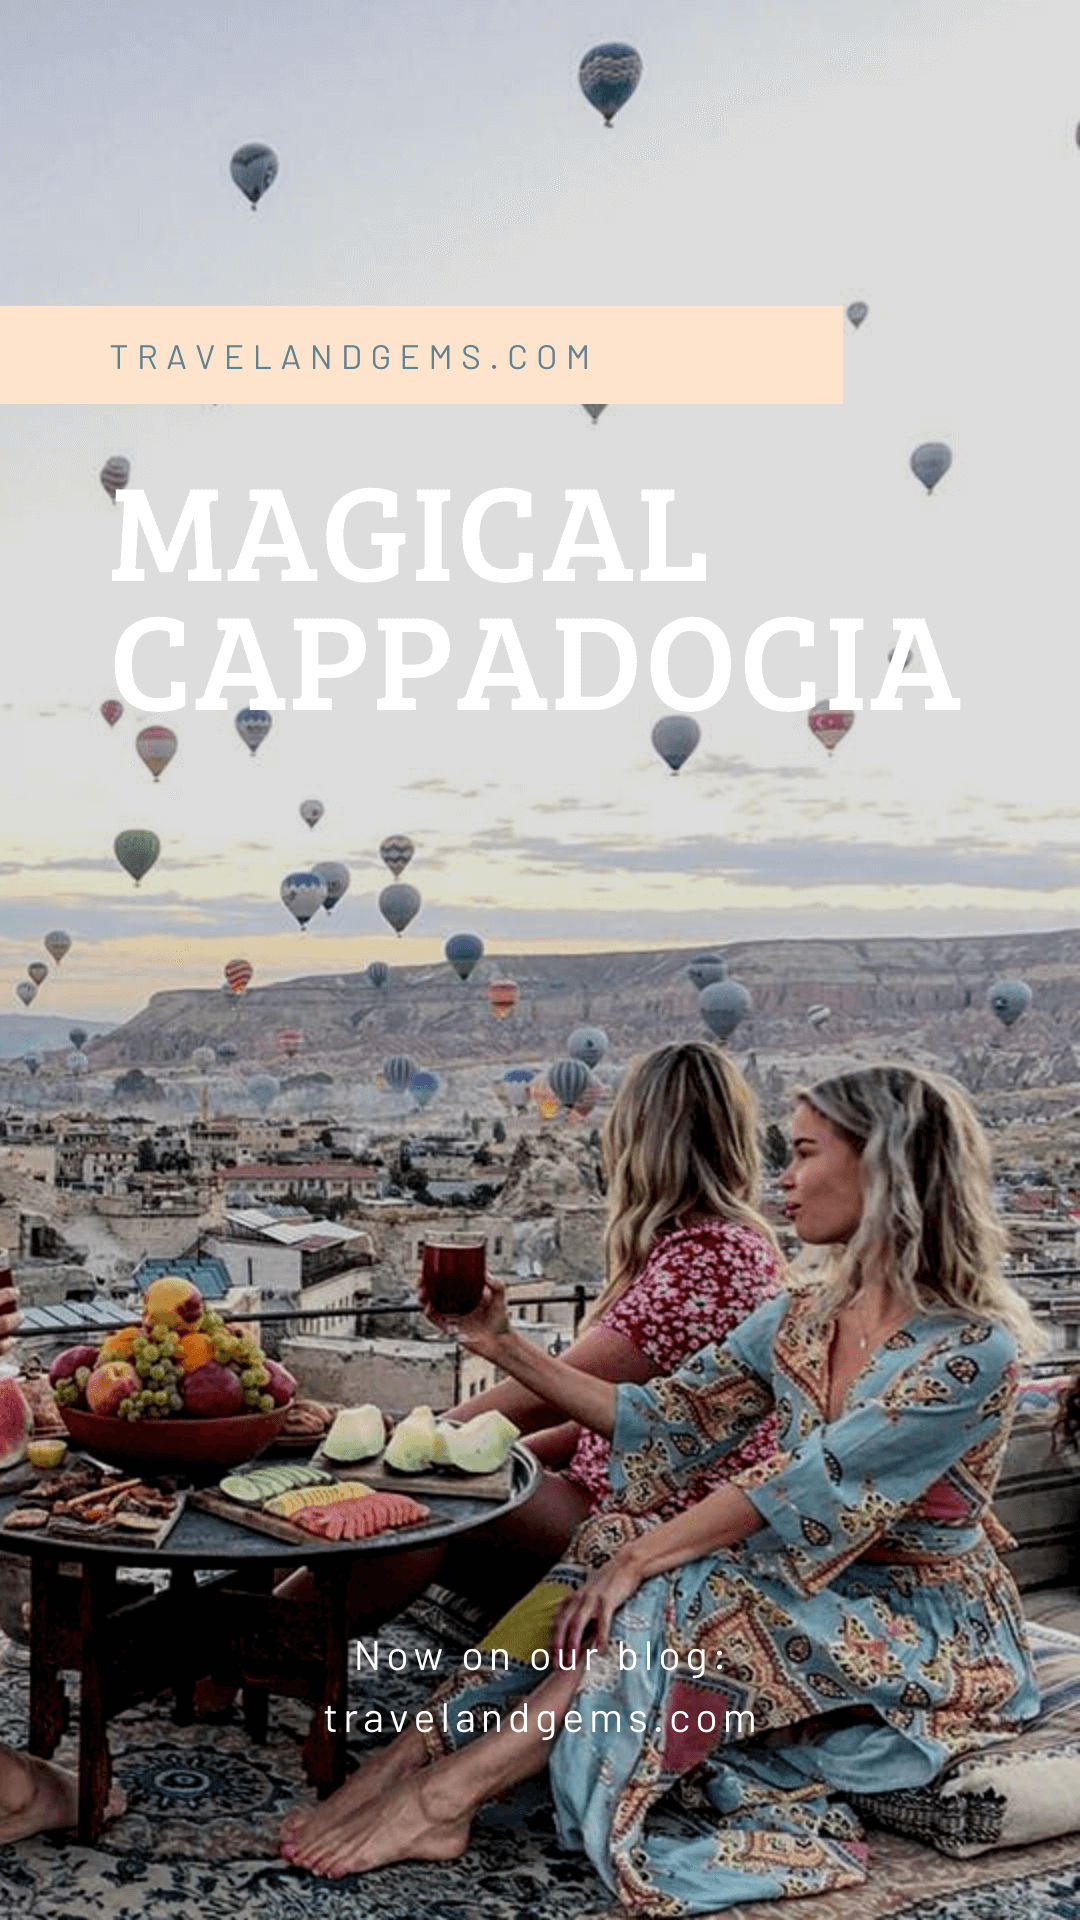 Pinterest Cappadocia - Travel & Gems